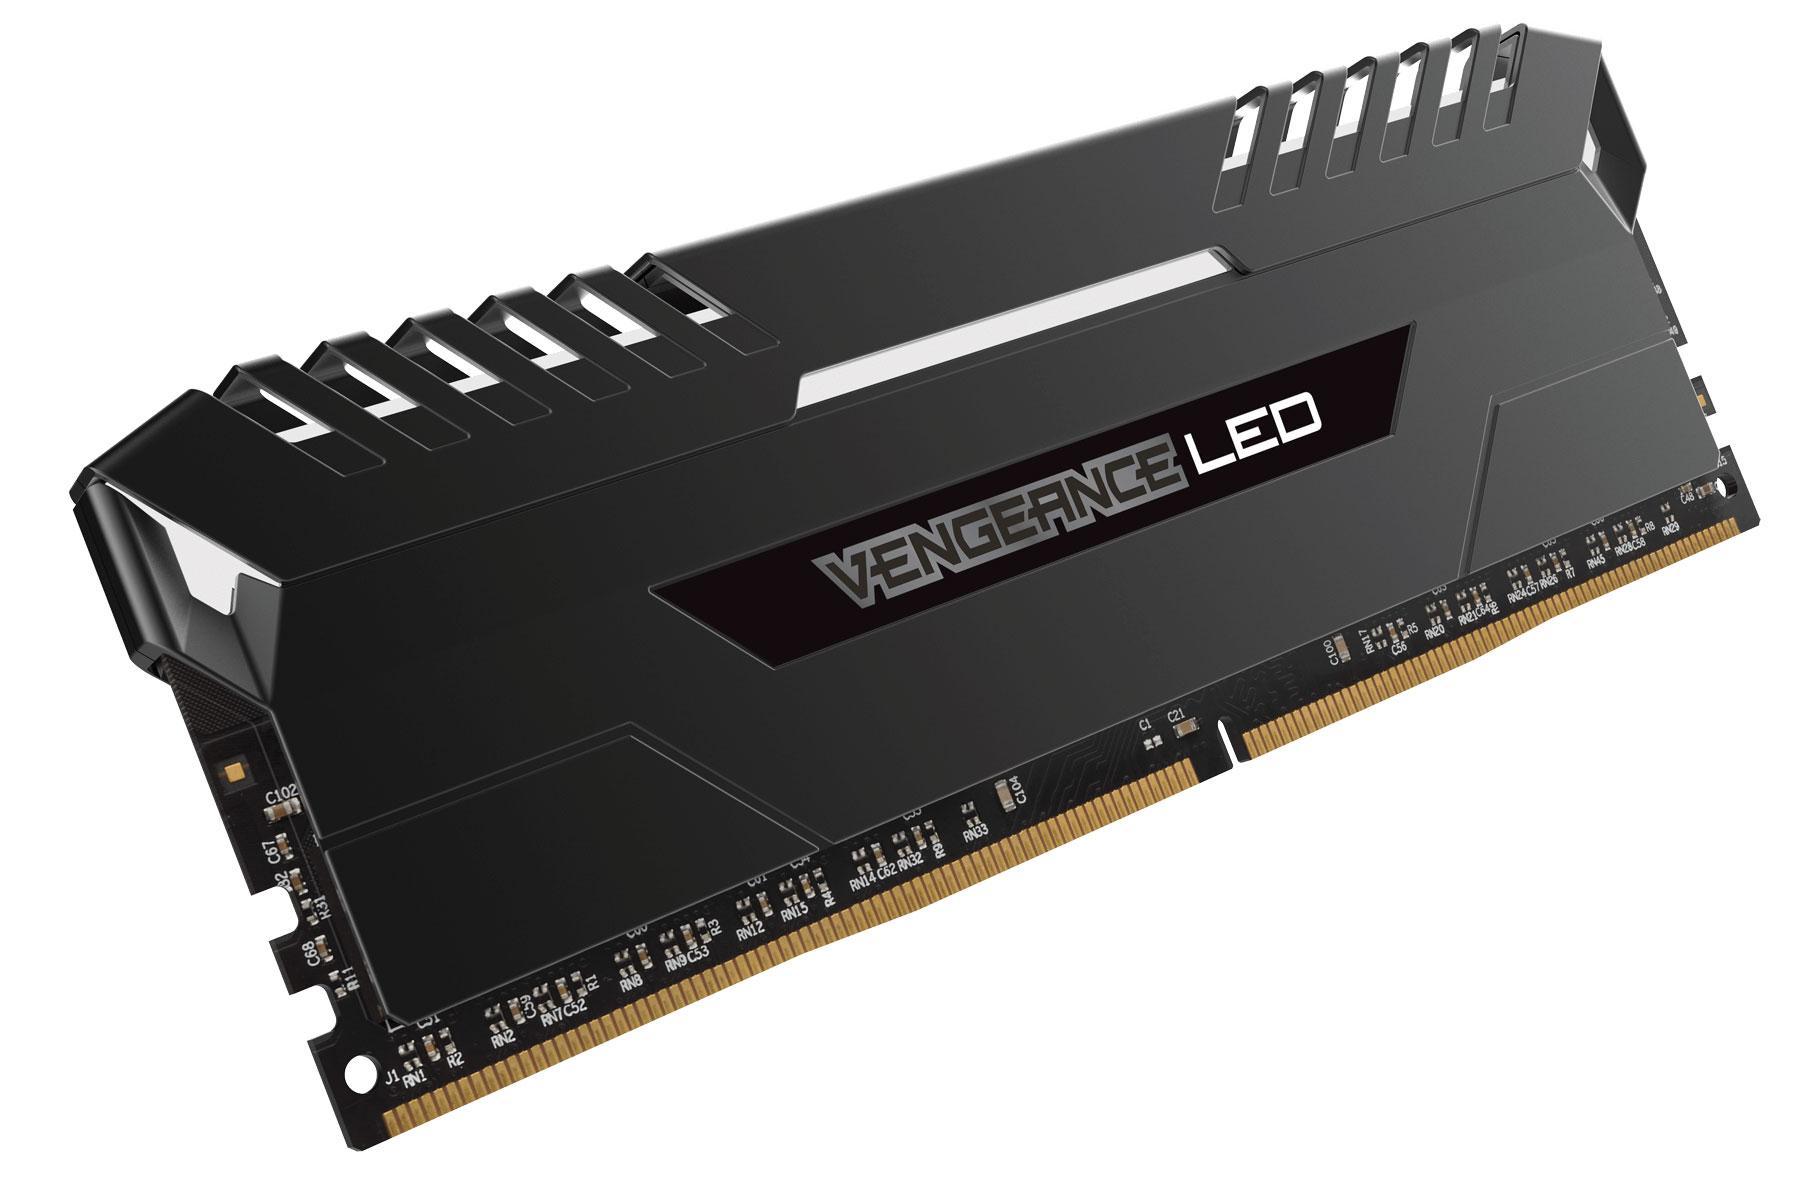 Corsair Vengeance 16GB 2x8GB DDR4 3200 PC4 25600 C16 for Intel 100, White  LED CMU16GX4M2C3200C